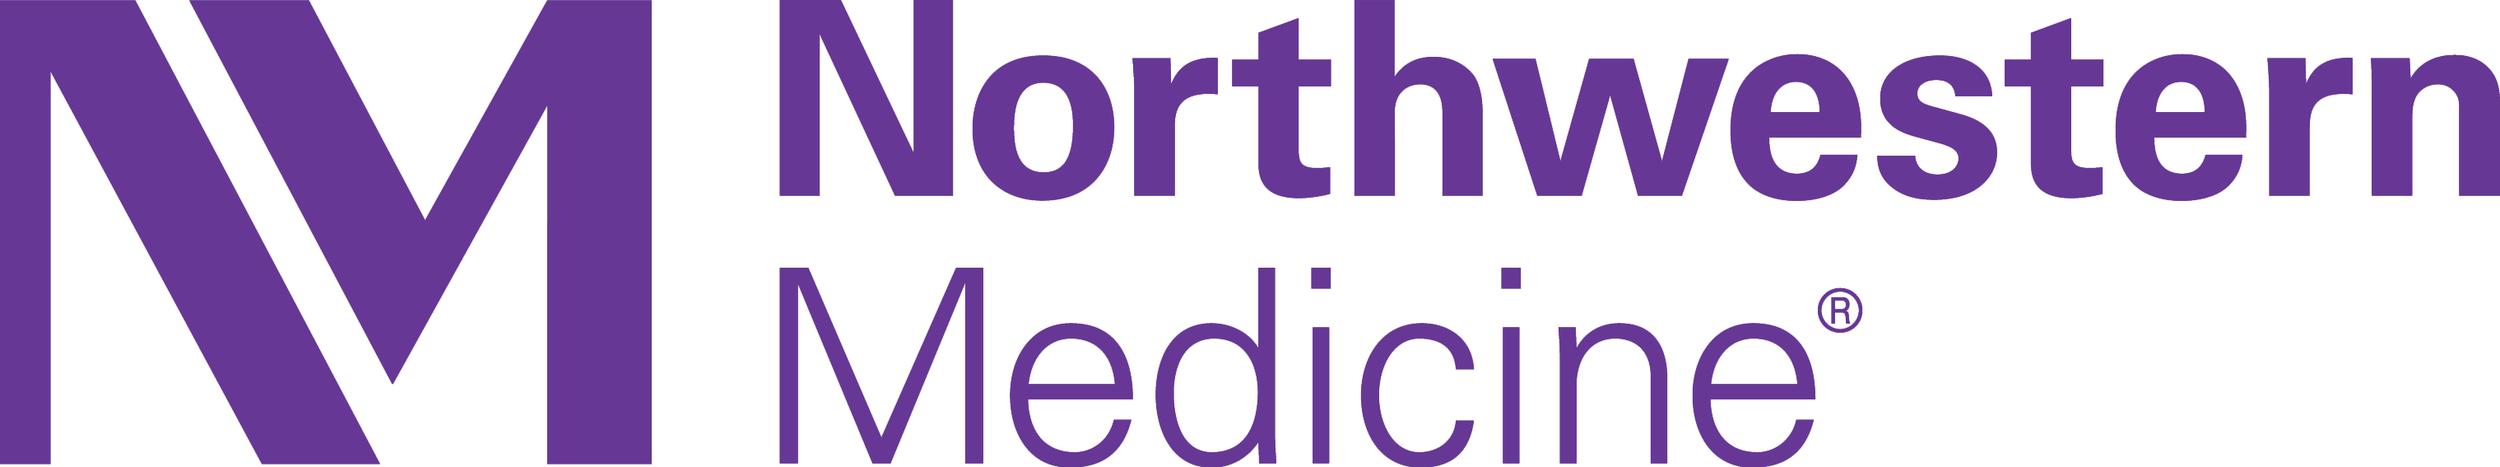 Northwestern Medicine Logo.png